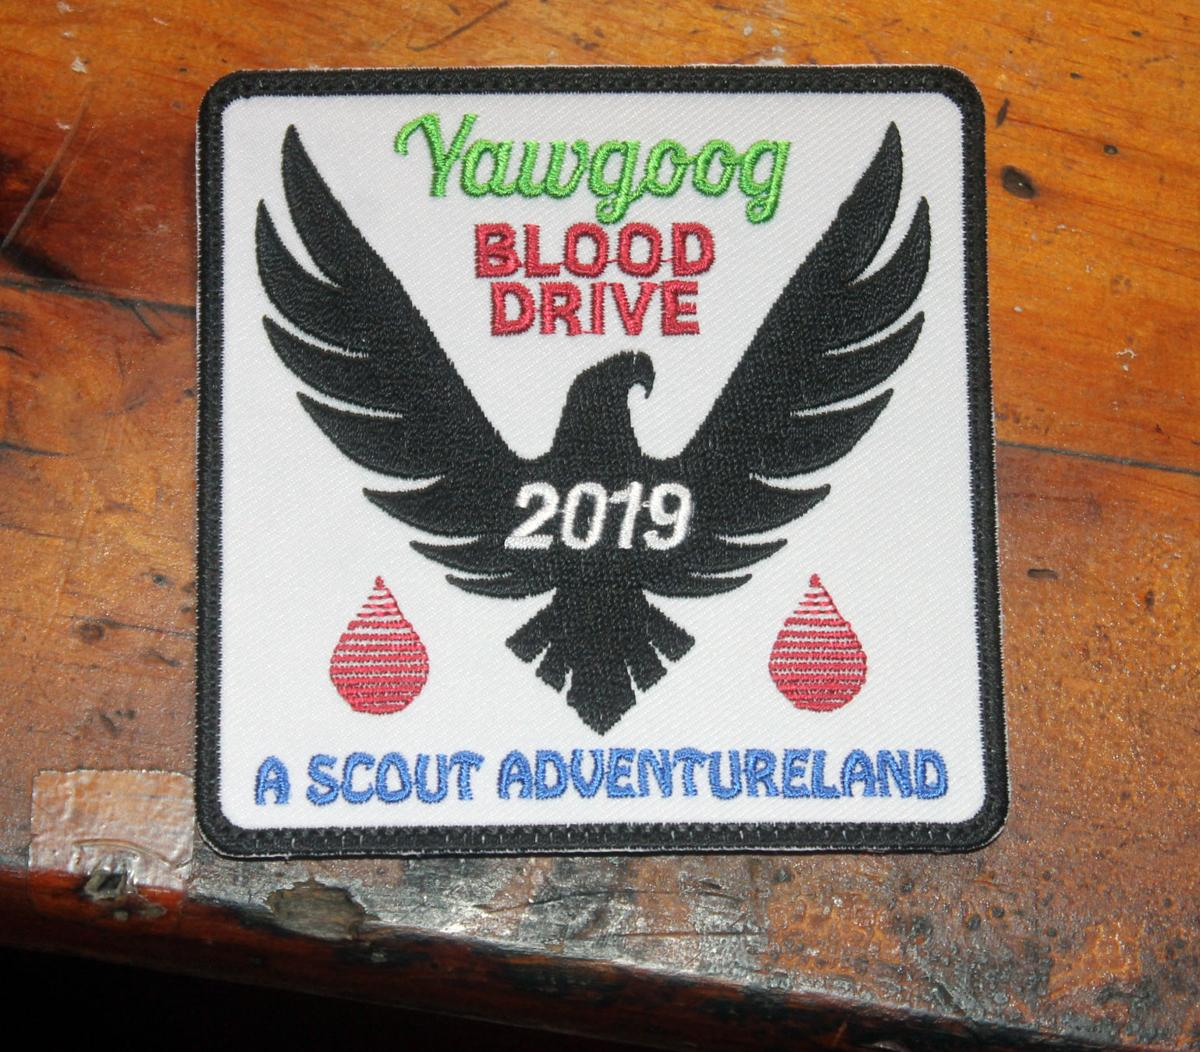 090419 HOP scouts giving blood cd03.JPG